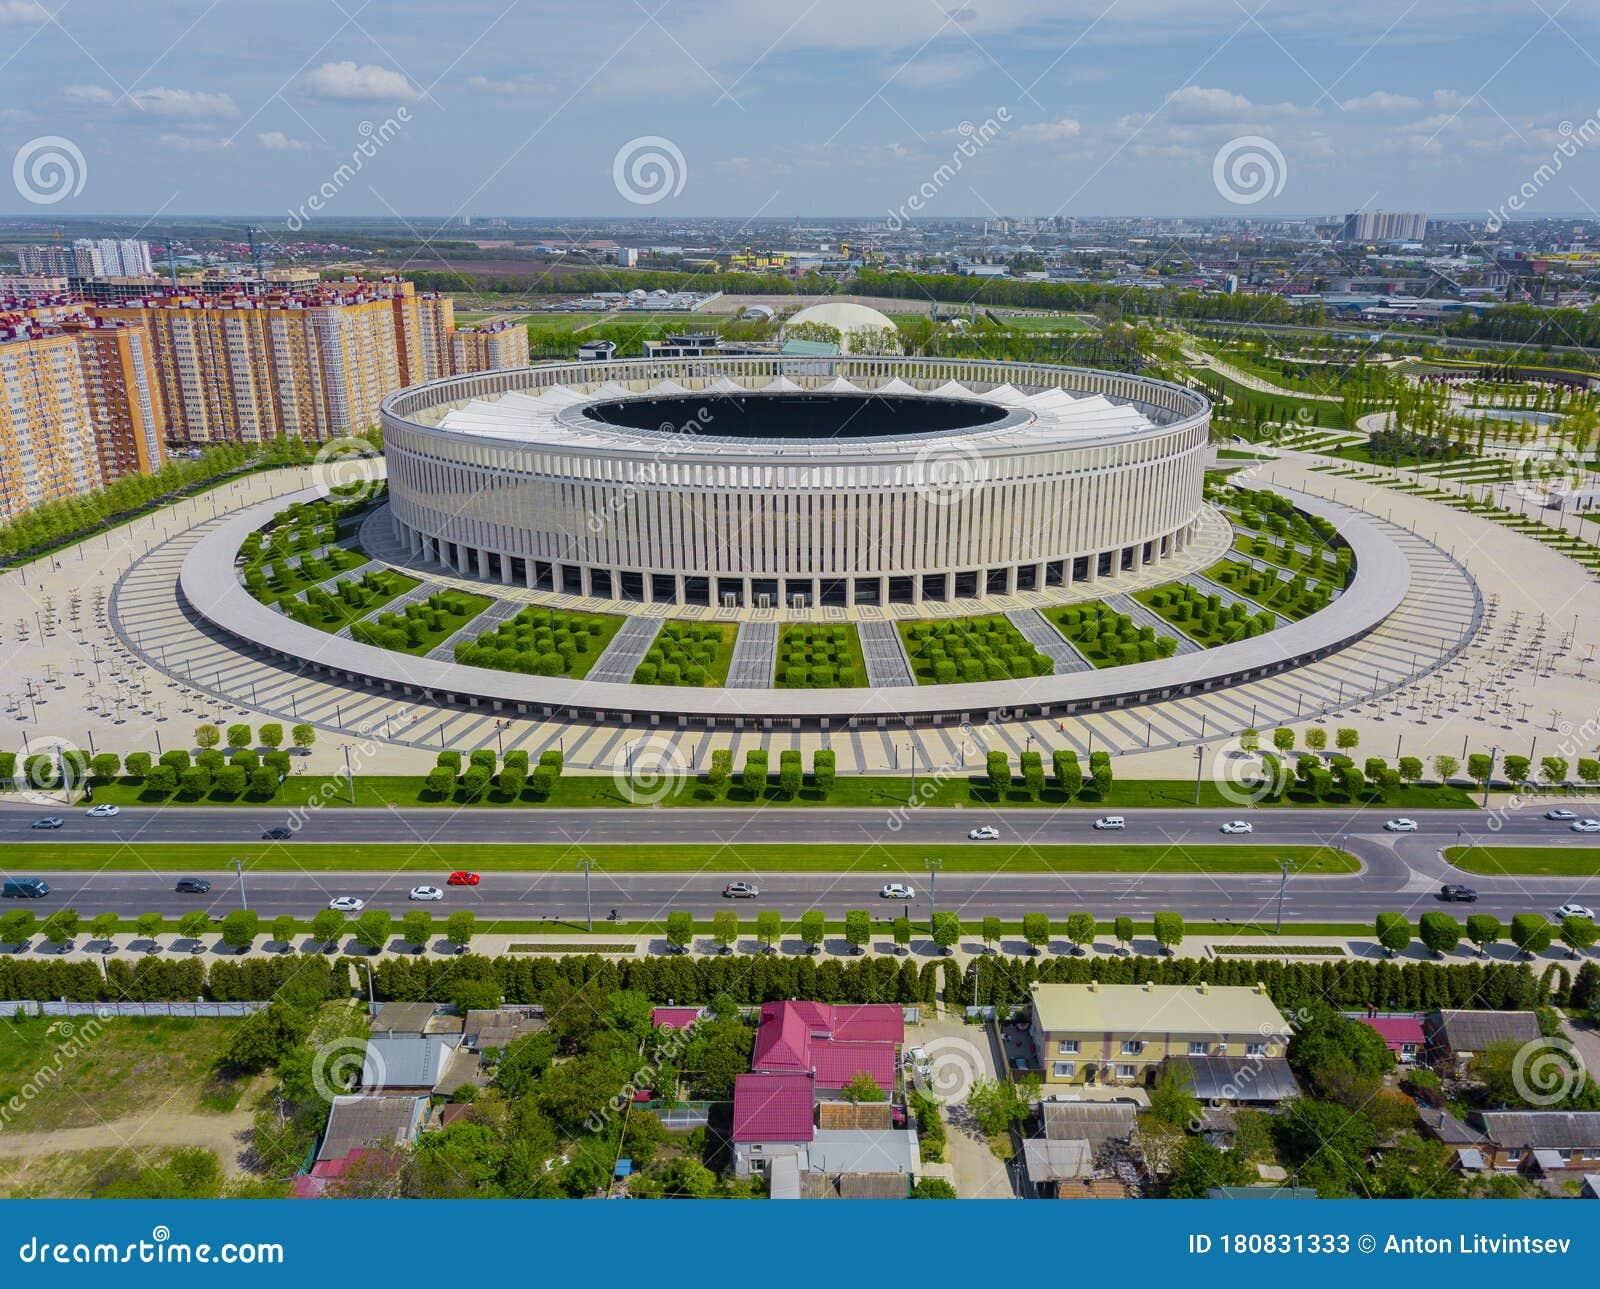 Krasnodar Russia April 2020 Aerial View Of Fc Krasnodar Stadium Editorial Stock Photo Image Of Landmark Travel 180831333